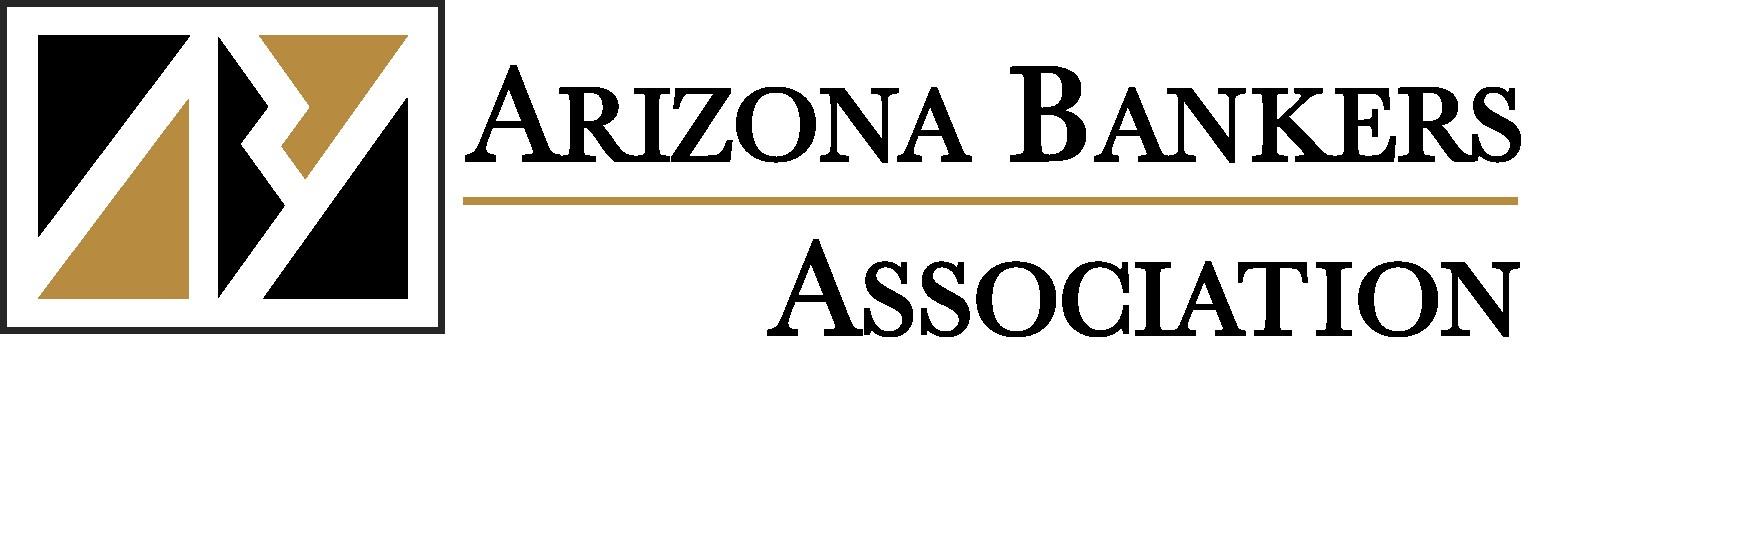 azbankers color logo